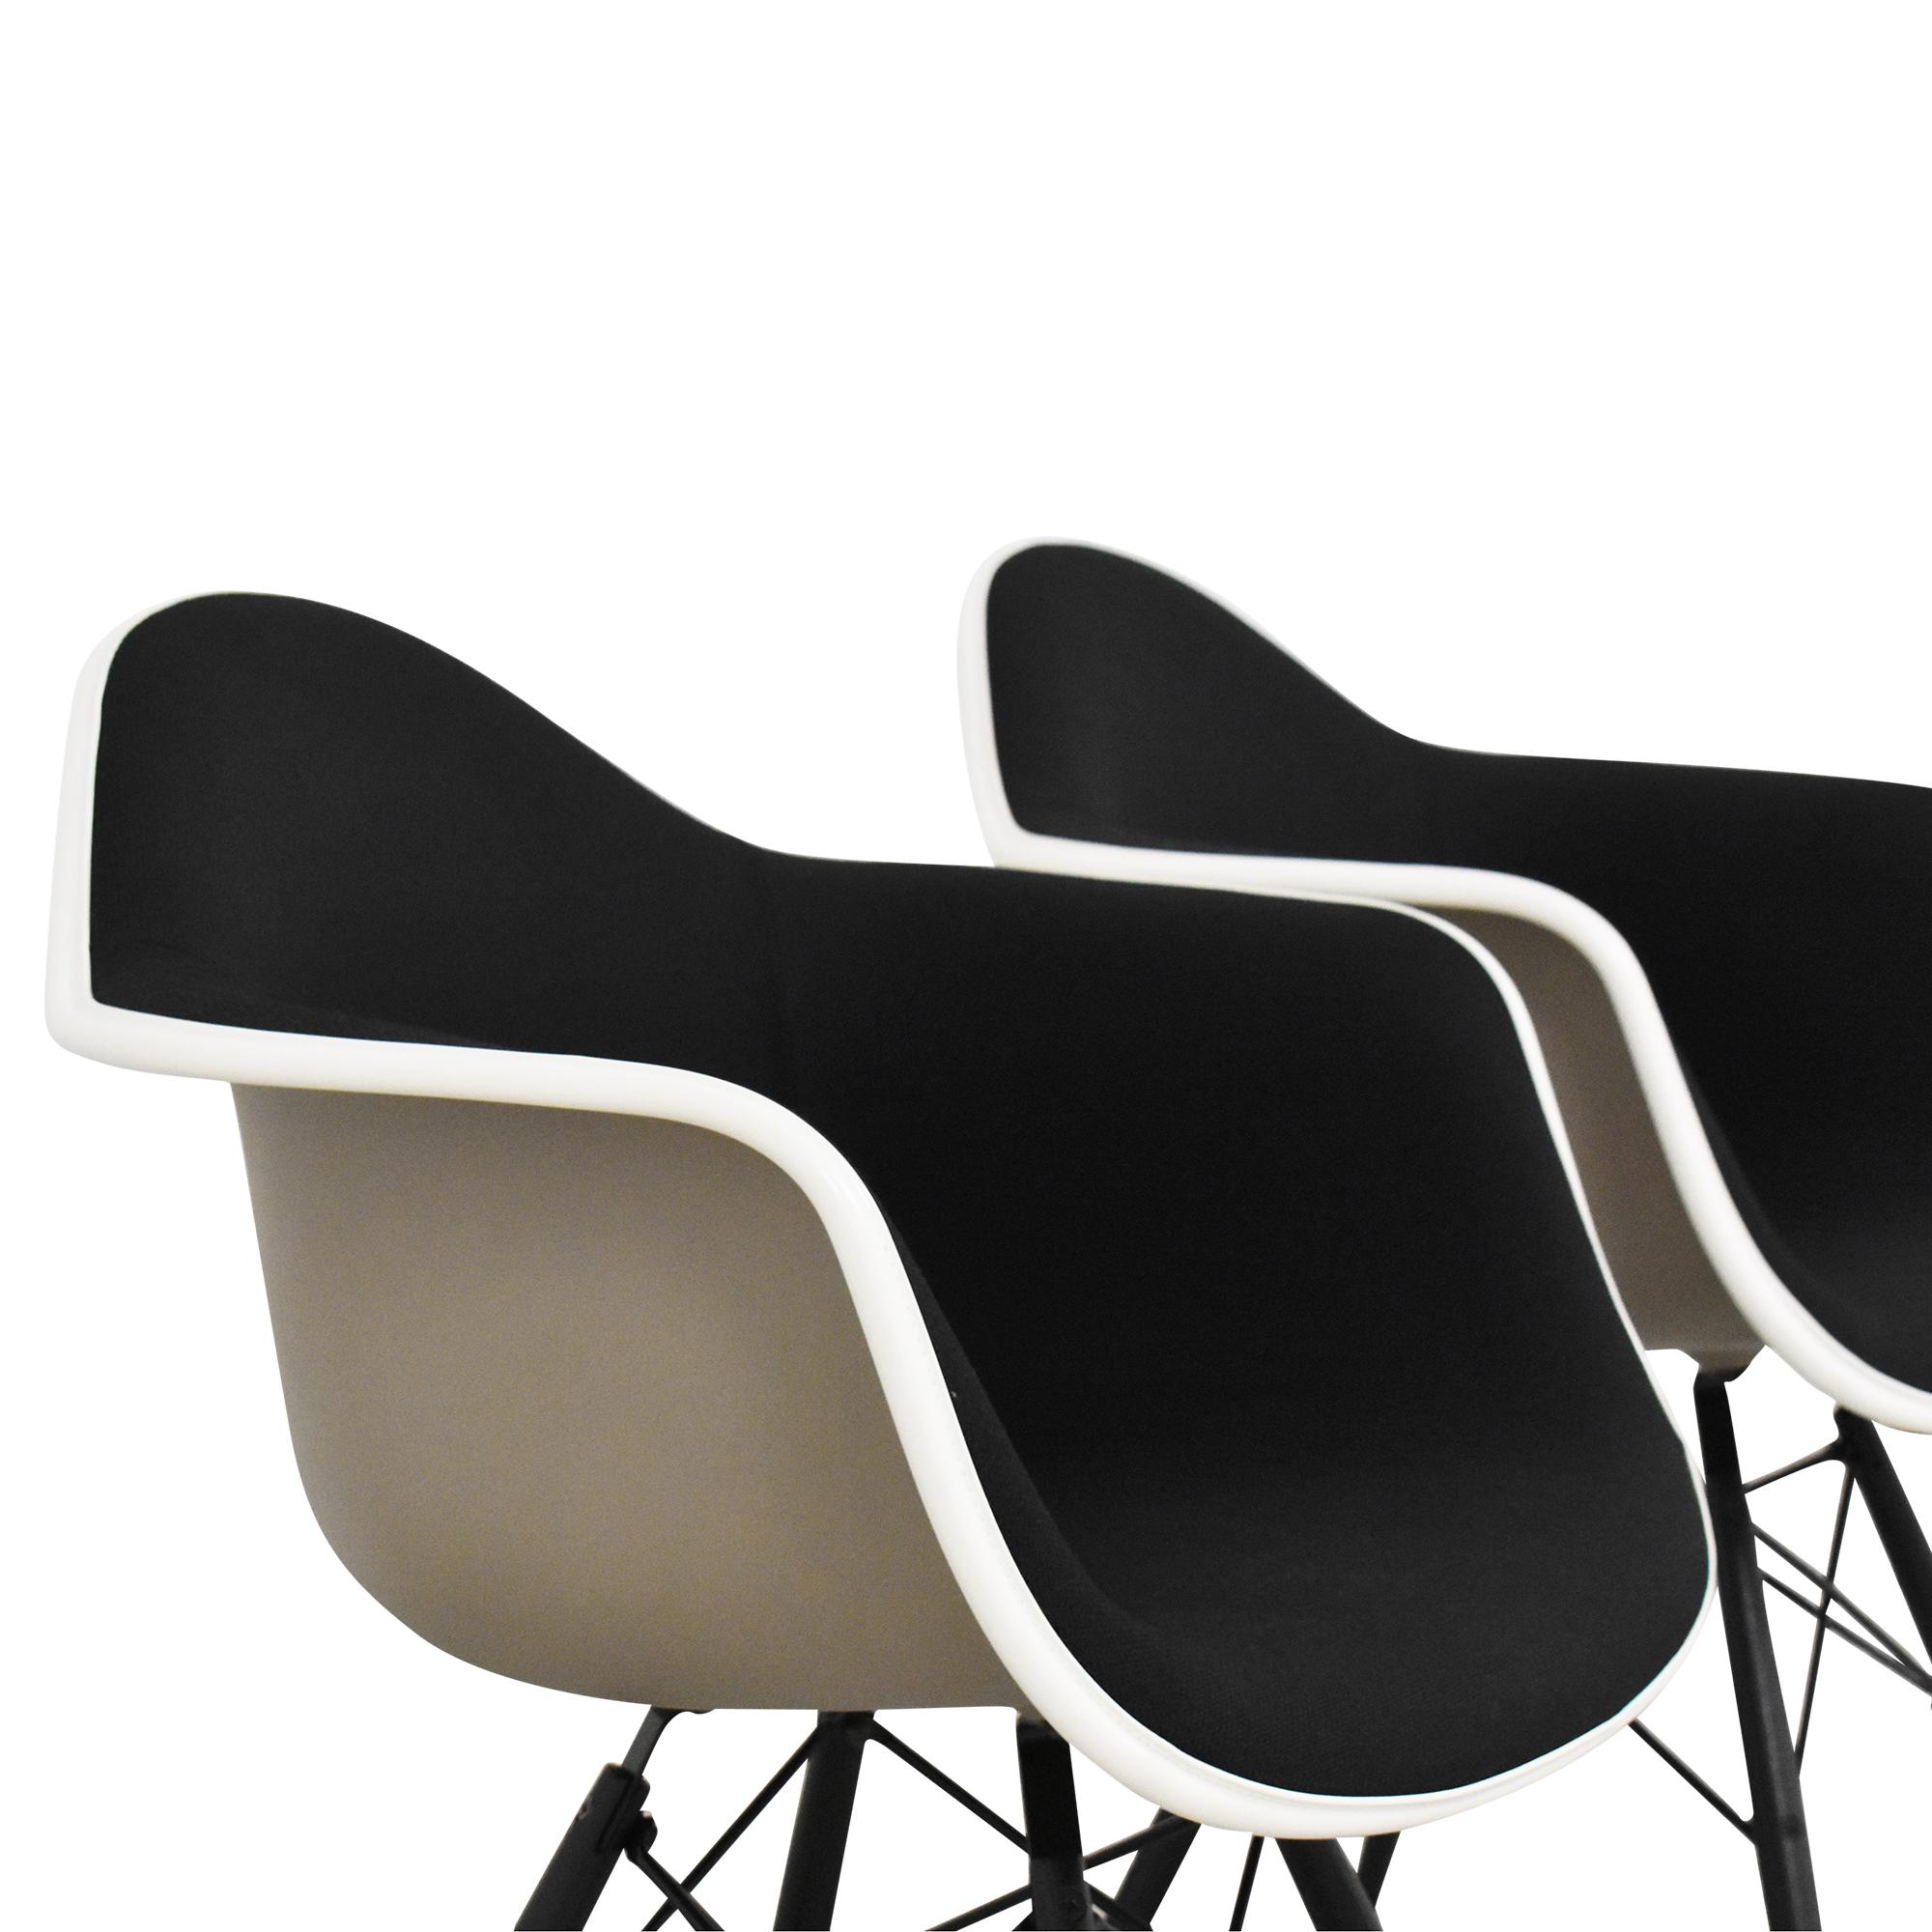 Herman Miller Herman Miller Eames Molded Arm Chairs